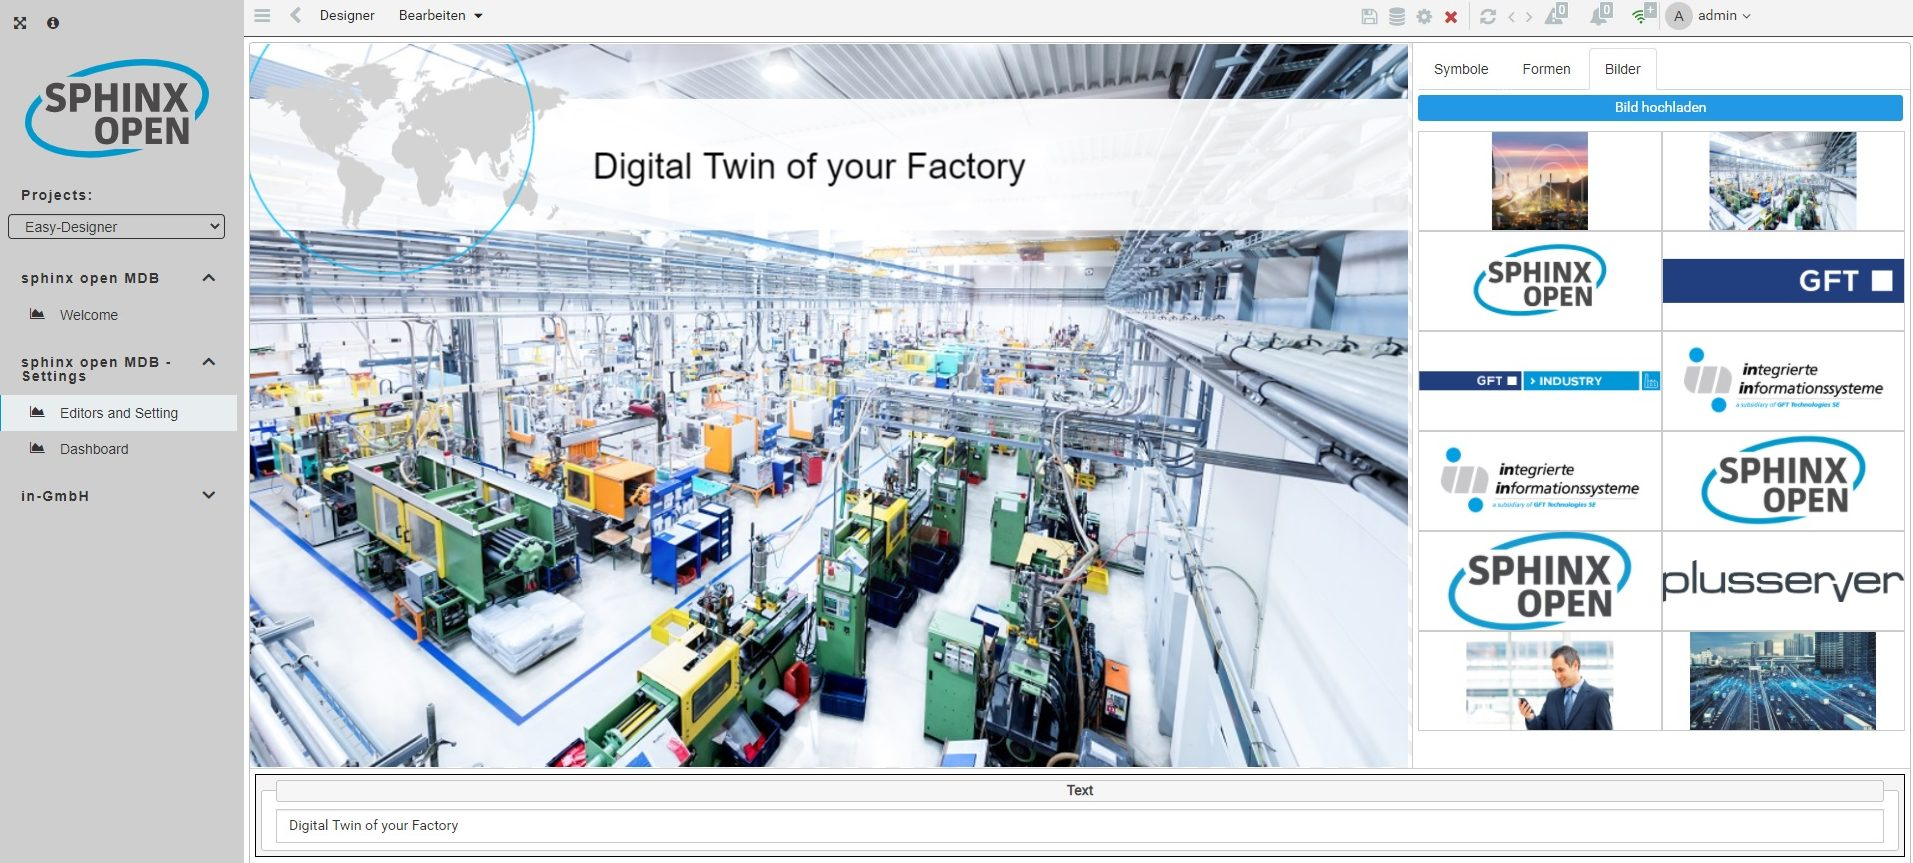 Bild: GFT Technologies SE